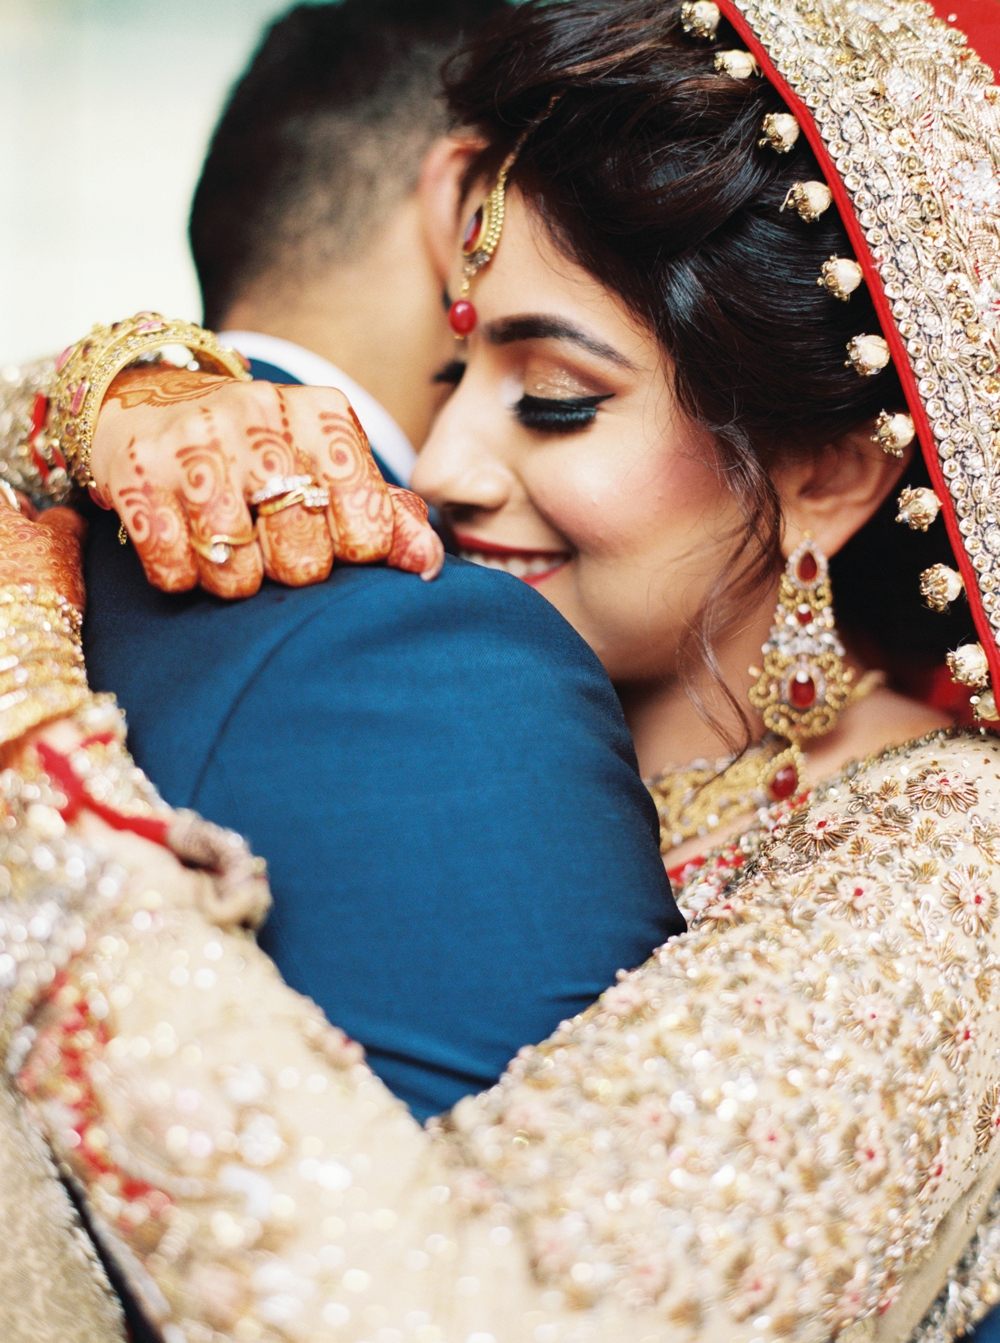 Calgary Wedding Photographer | Pakistani Wedding | The Bay Building Downtown | Sait Parkade